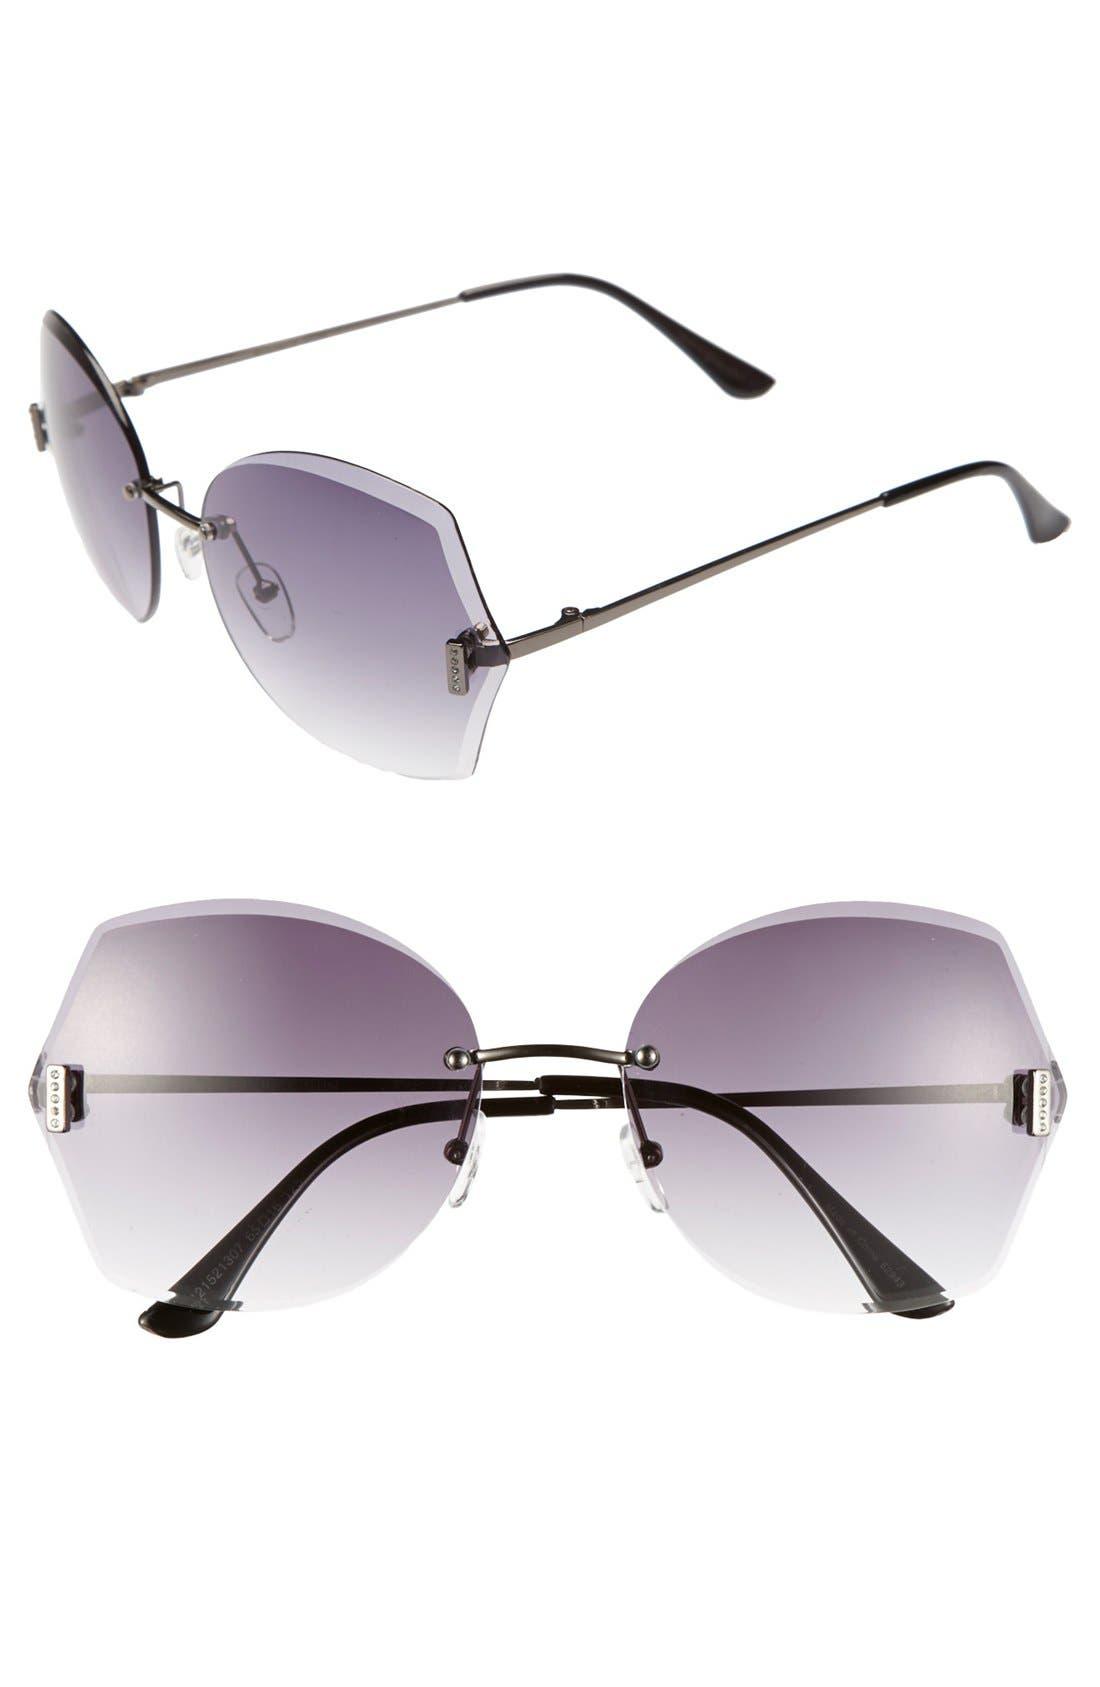 Main Image - Outlook Eyewear 'Bounce' 65mm Sunglasses